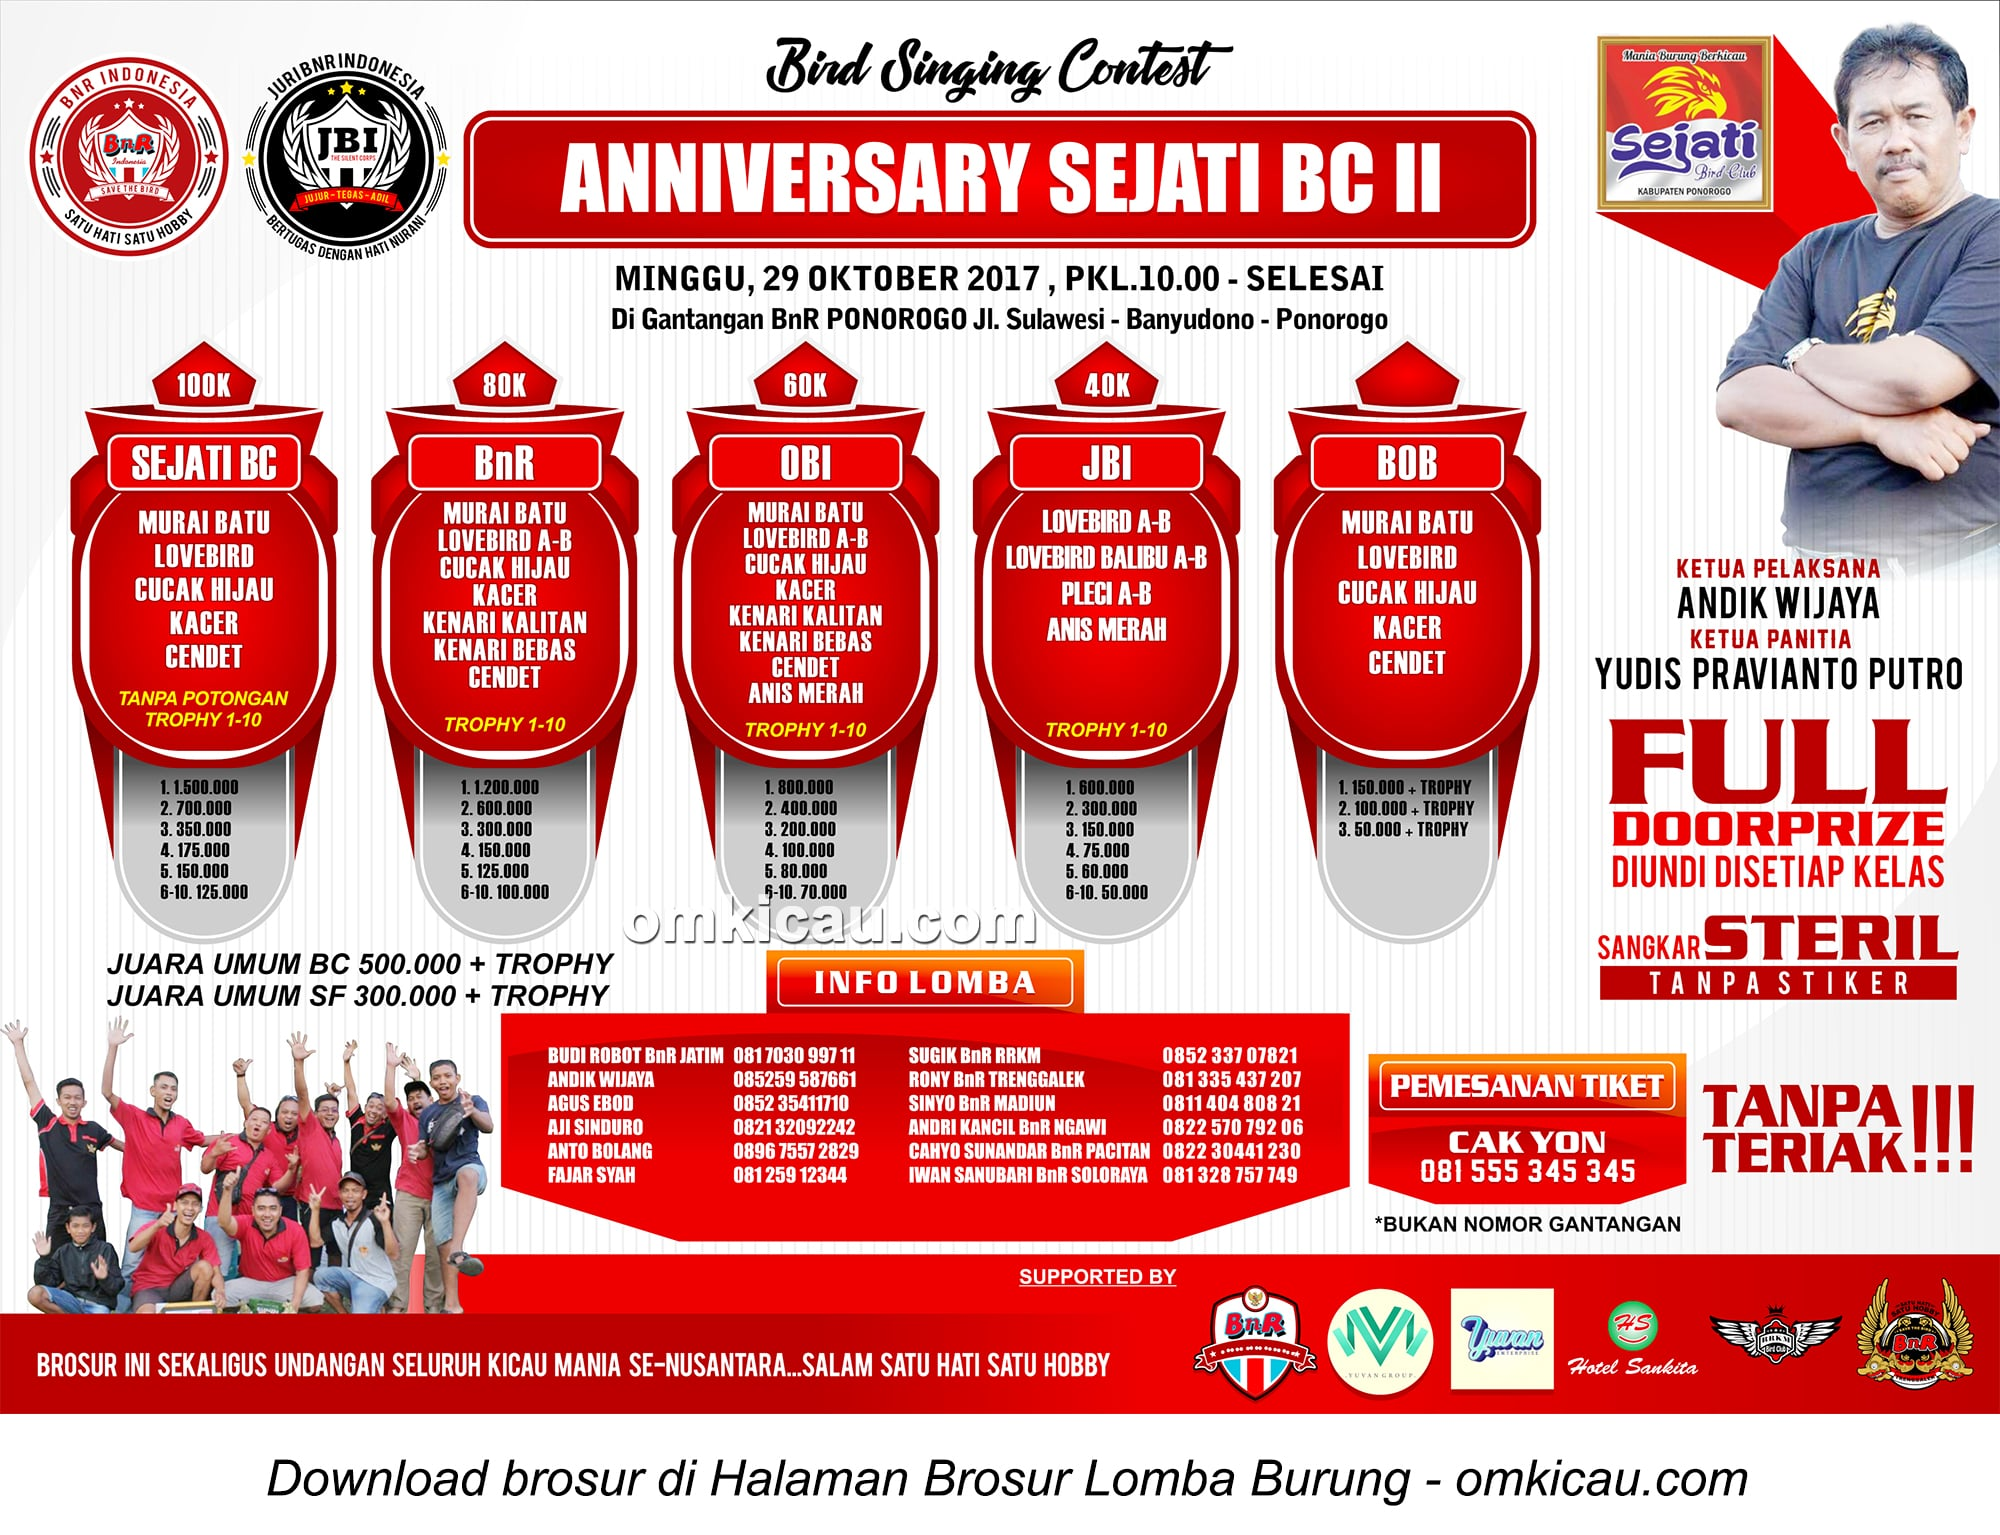 Anniversary Sejati BC II Ponorogo